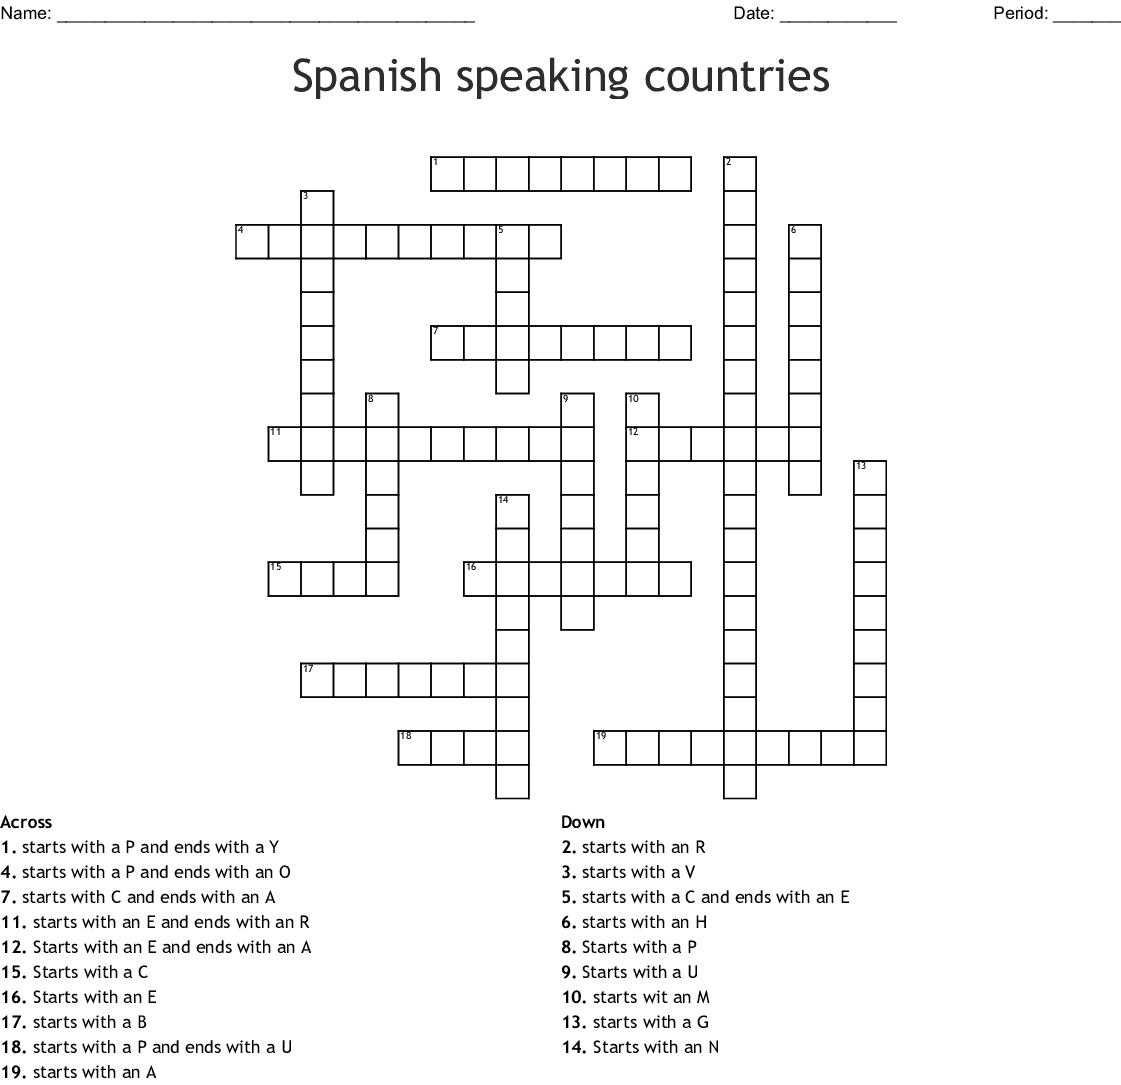 Spanish Speaking Countries Crossword - Wordmint - Printable Spanish Crossword Puzzle Answers